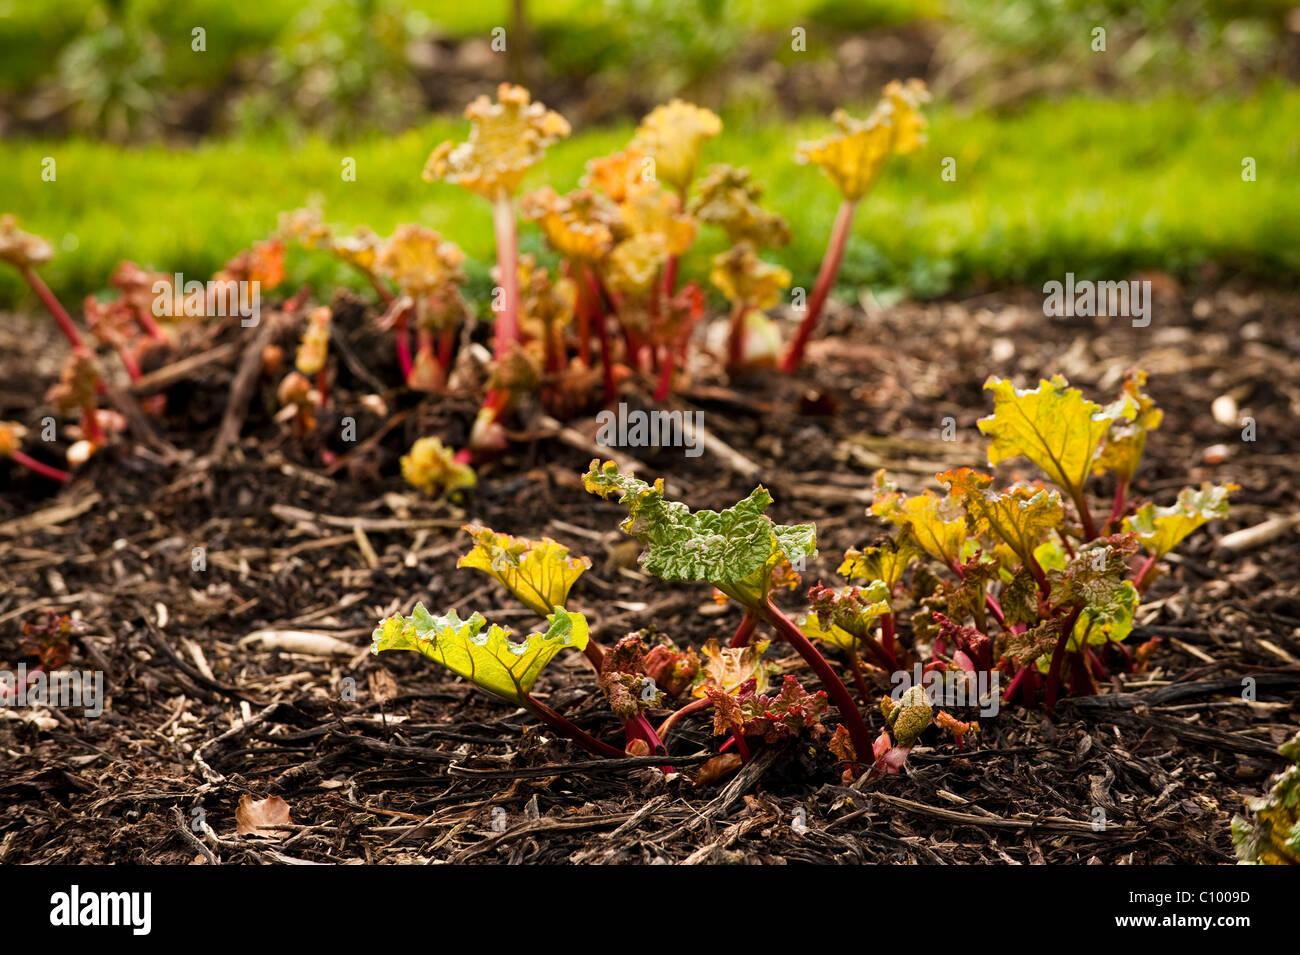 Bed of Rhubarb, Rheum rhabarbarum, sprouting in February - Stock Image